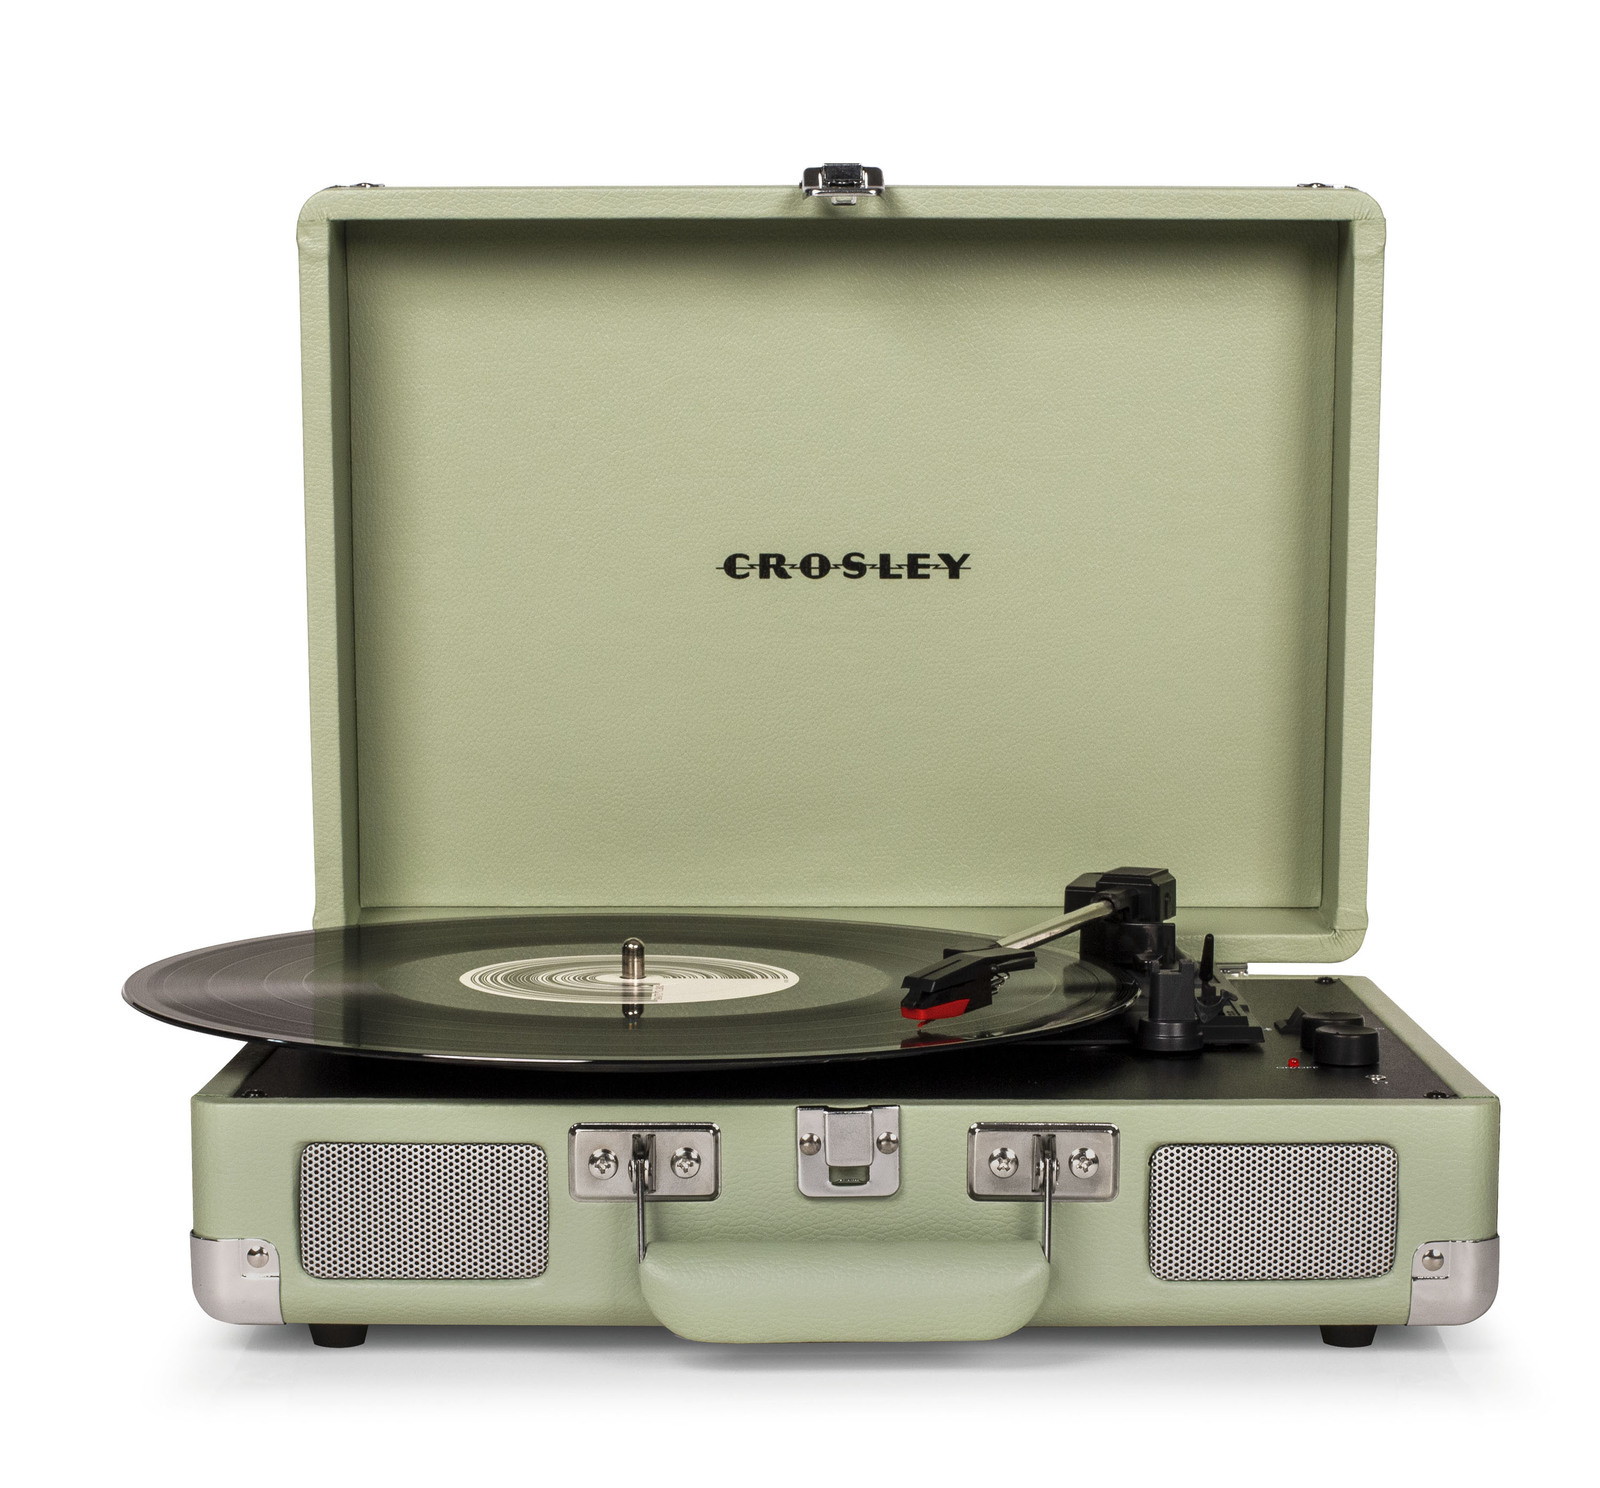 Crosley: Cruiser Deluxe Portable Turntable - Mint image